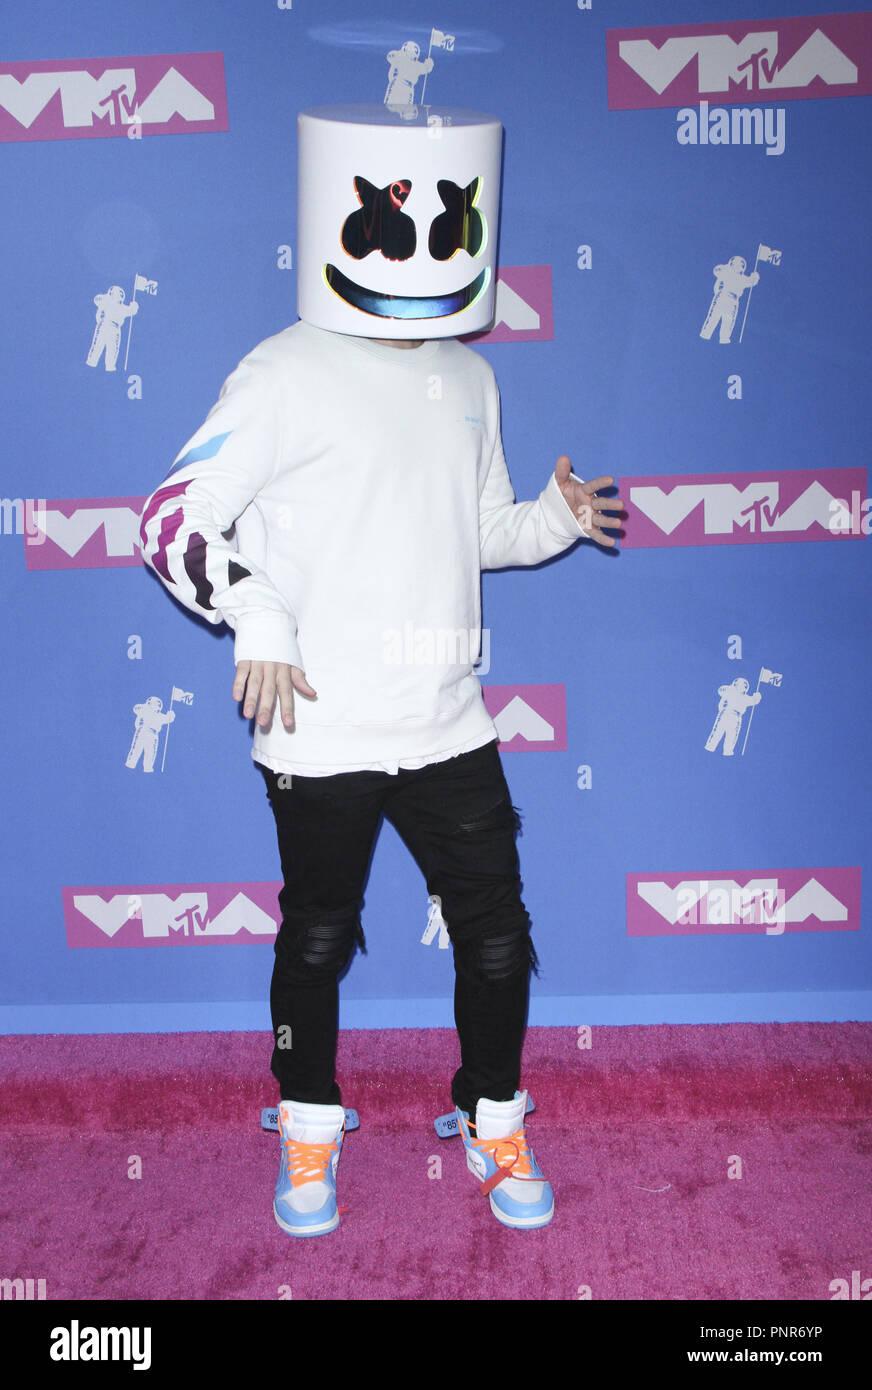 2018 MTV Video Music Awards - Arrivals Featuring: DJ Marshmello